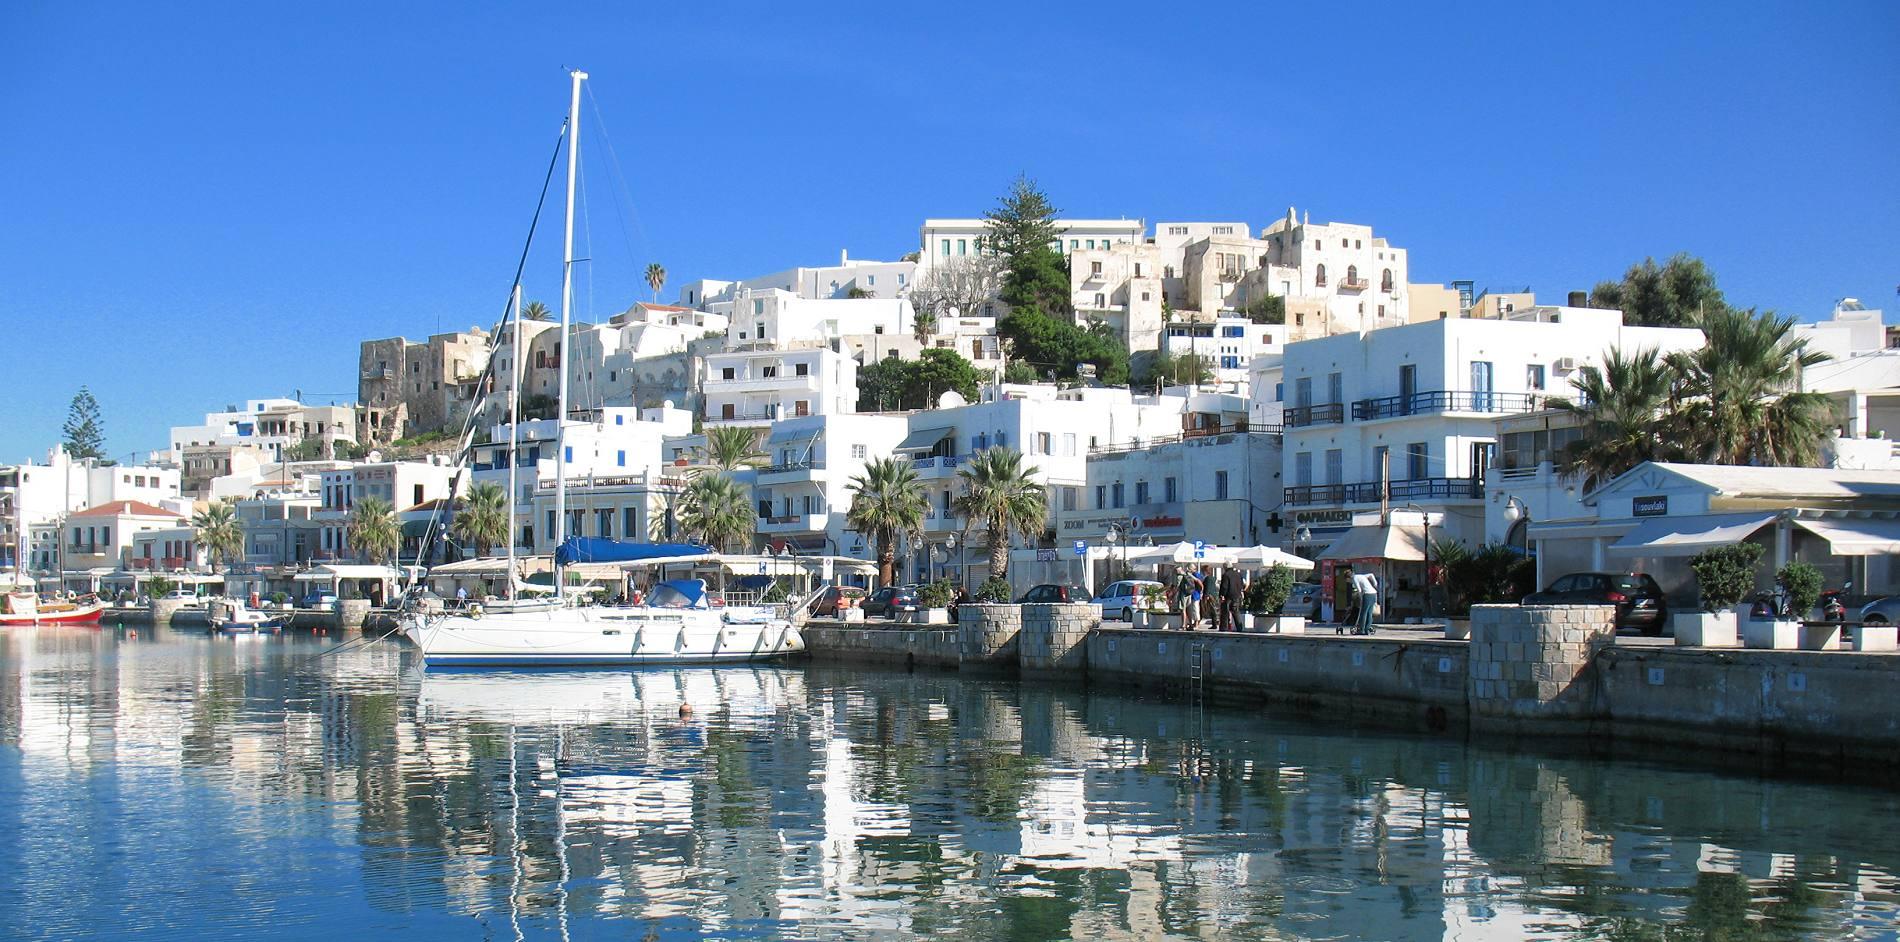 Naxos Town (Chora)